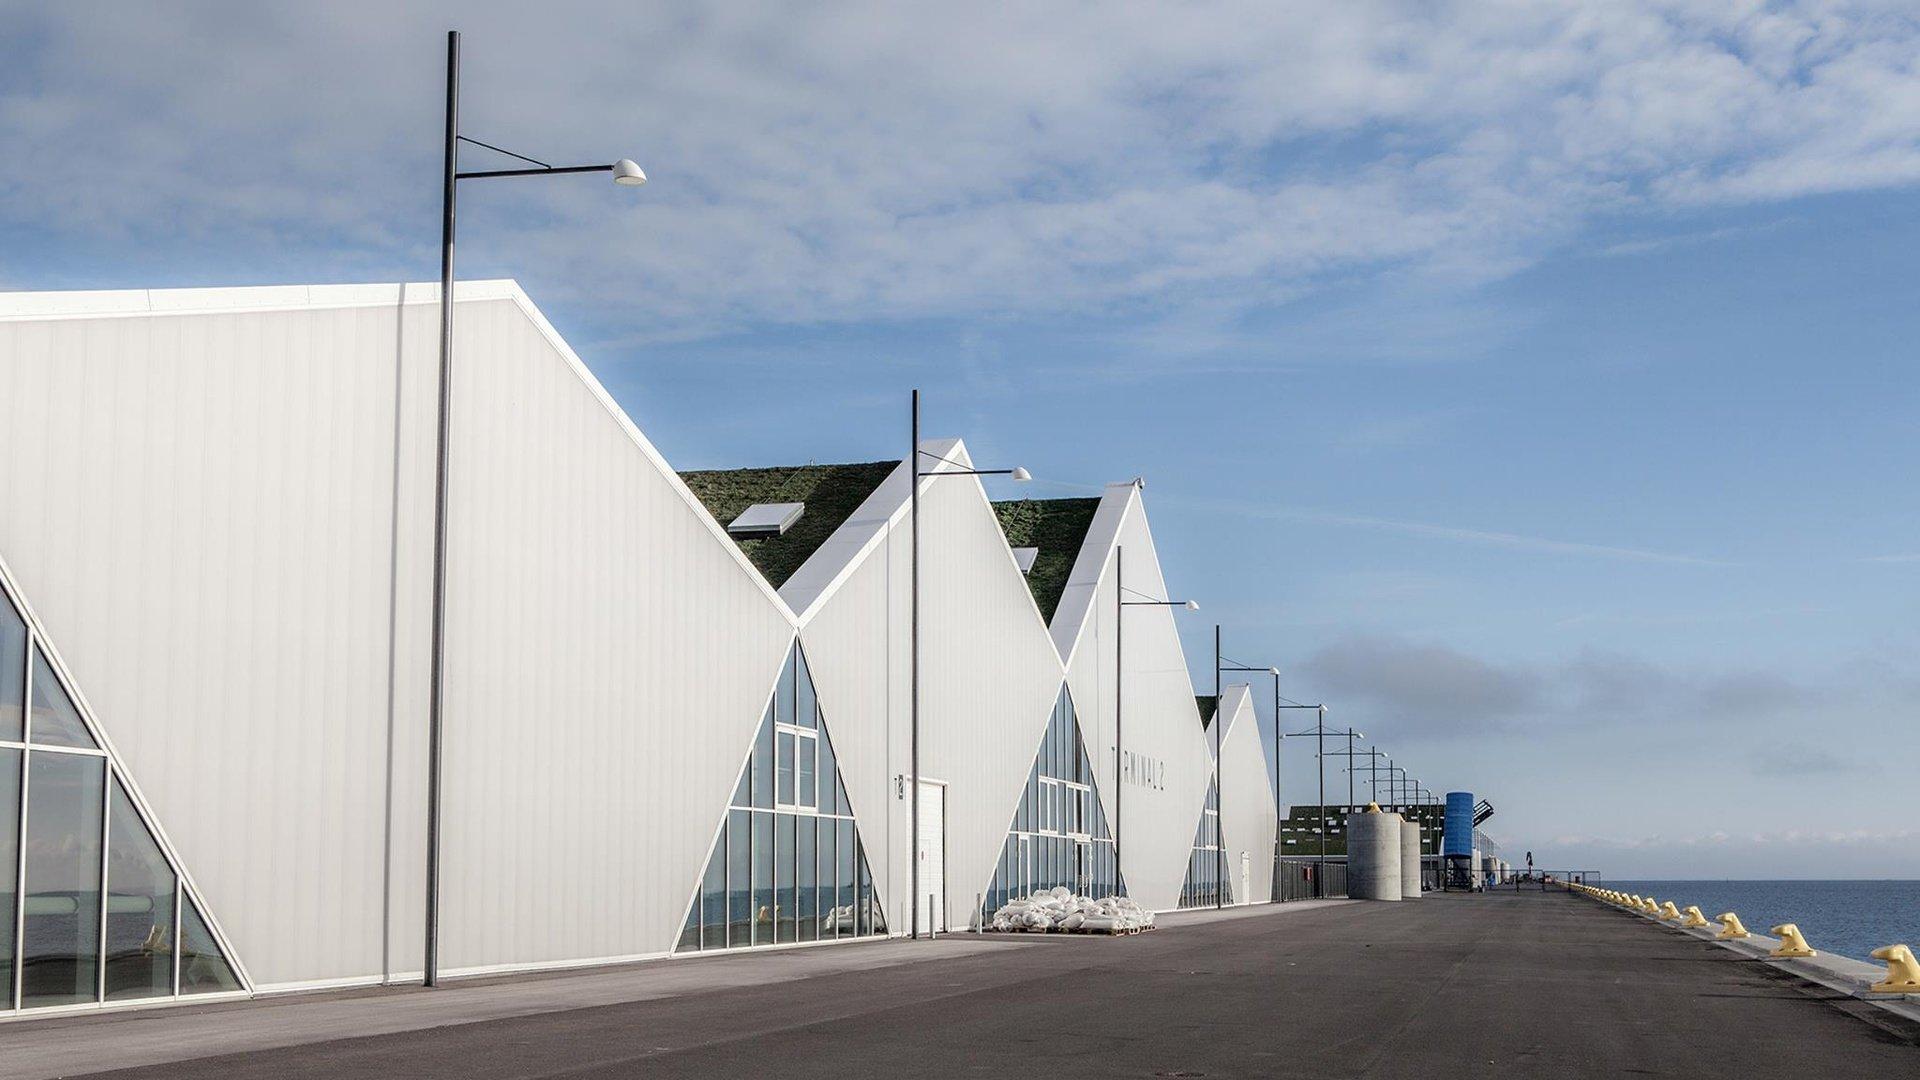 Copenhagen corporate event venues Industrial space The Terminals image 0